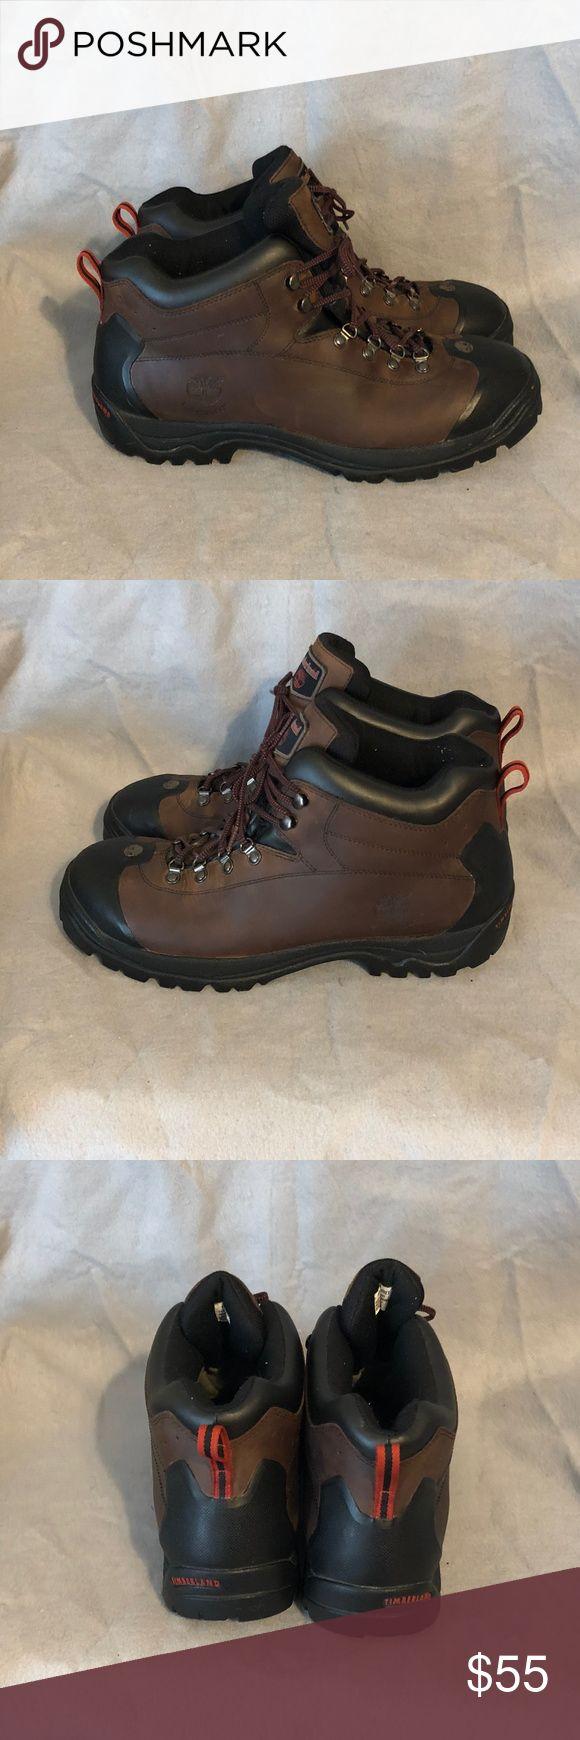 GUC Size 14 Timberland Waterproof Mid Hiking Boots